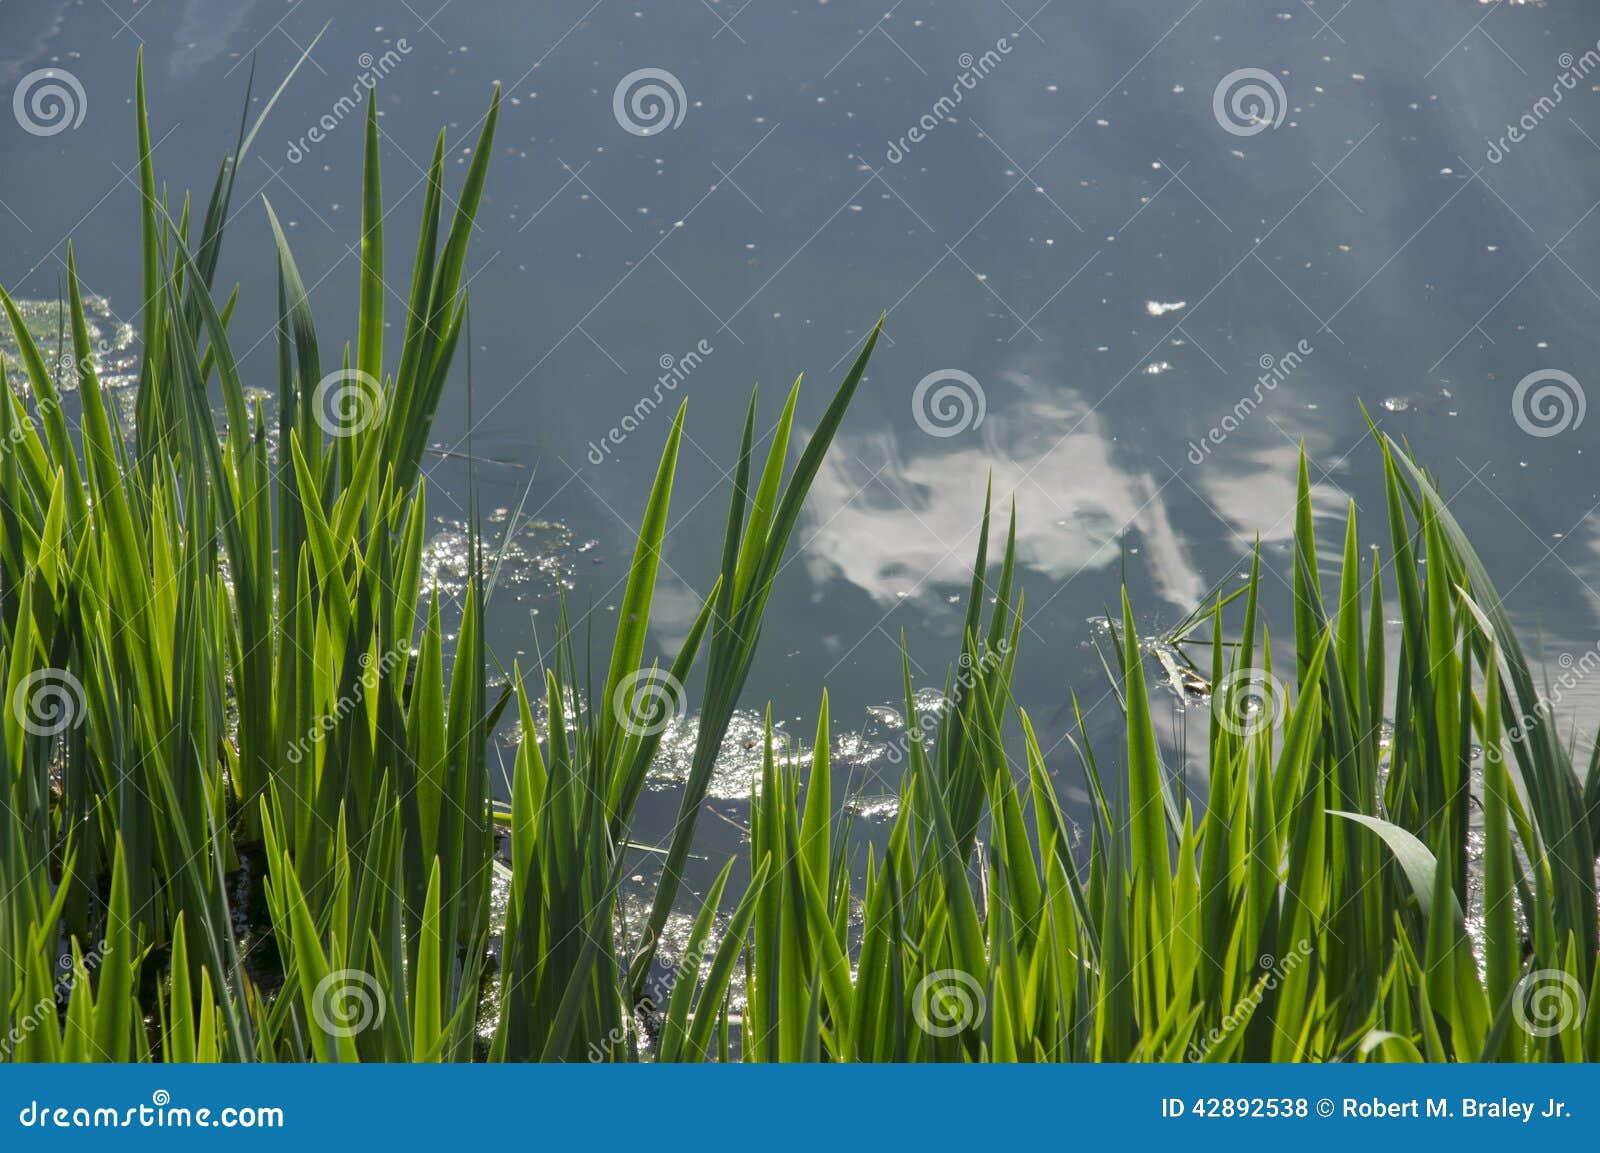 Blue Lake water green grass